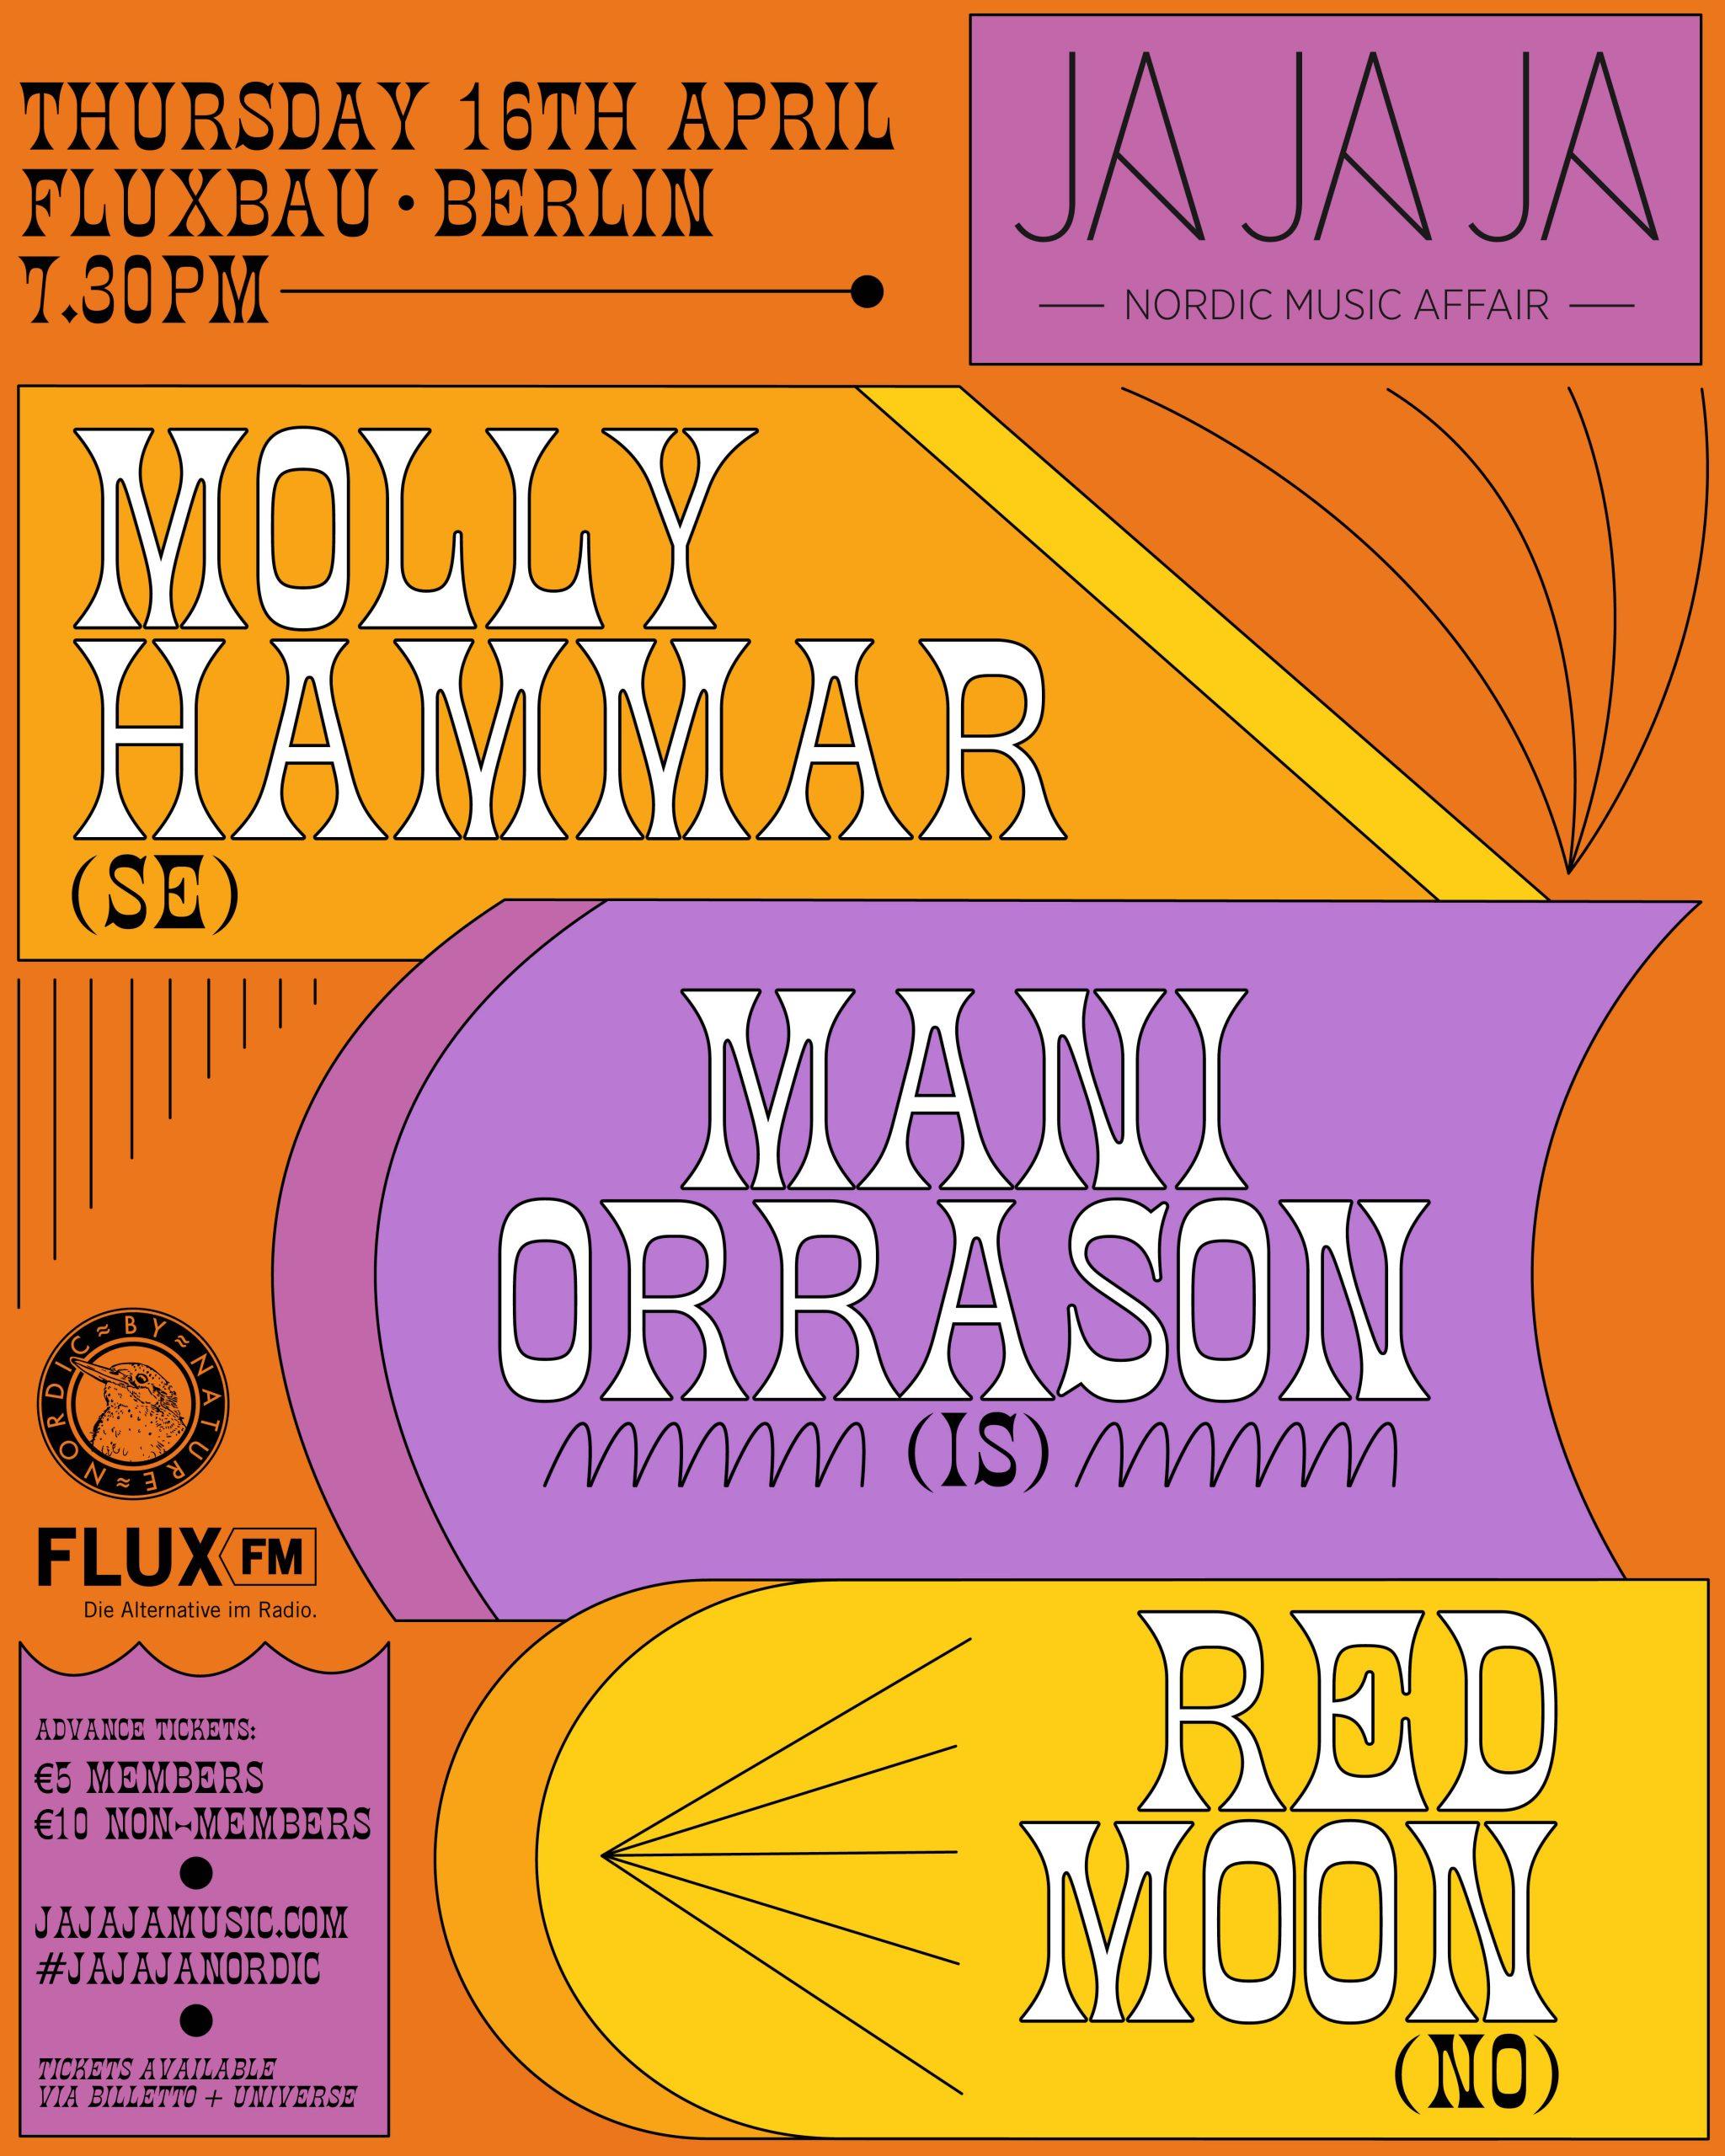 Ja Ja Ja Berlin: April 2020 with Molly Hammar, Mani Orrason + Red Moon